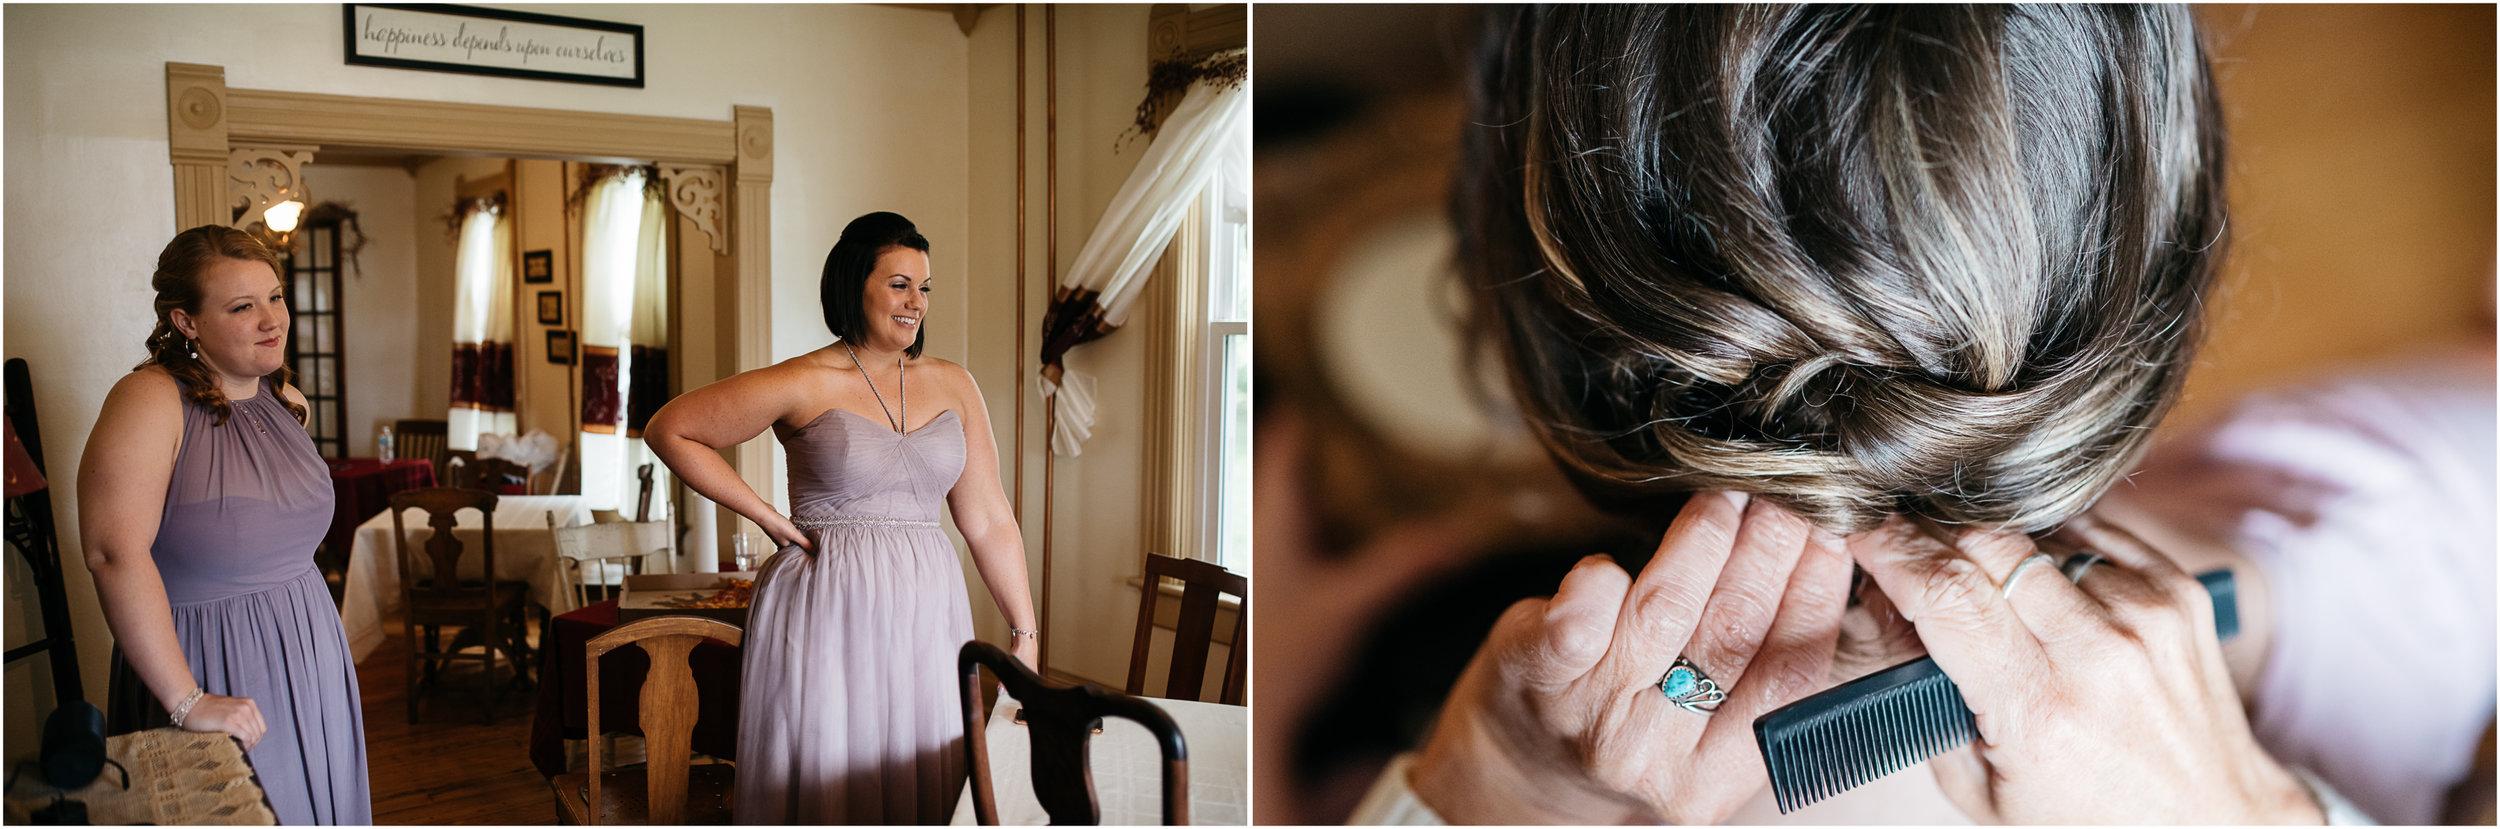 getting ready, Wedding photographer Pittsburgh & Ligonier PA, the Hayloft of Rockwood PA.jpg